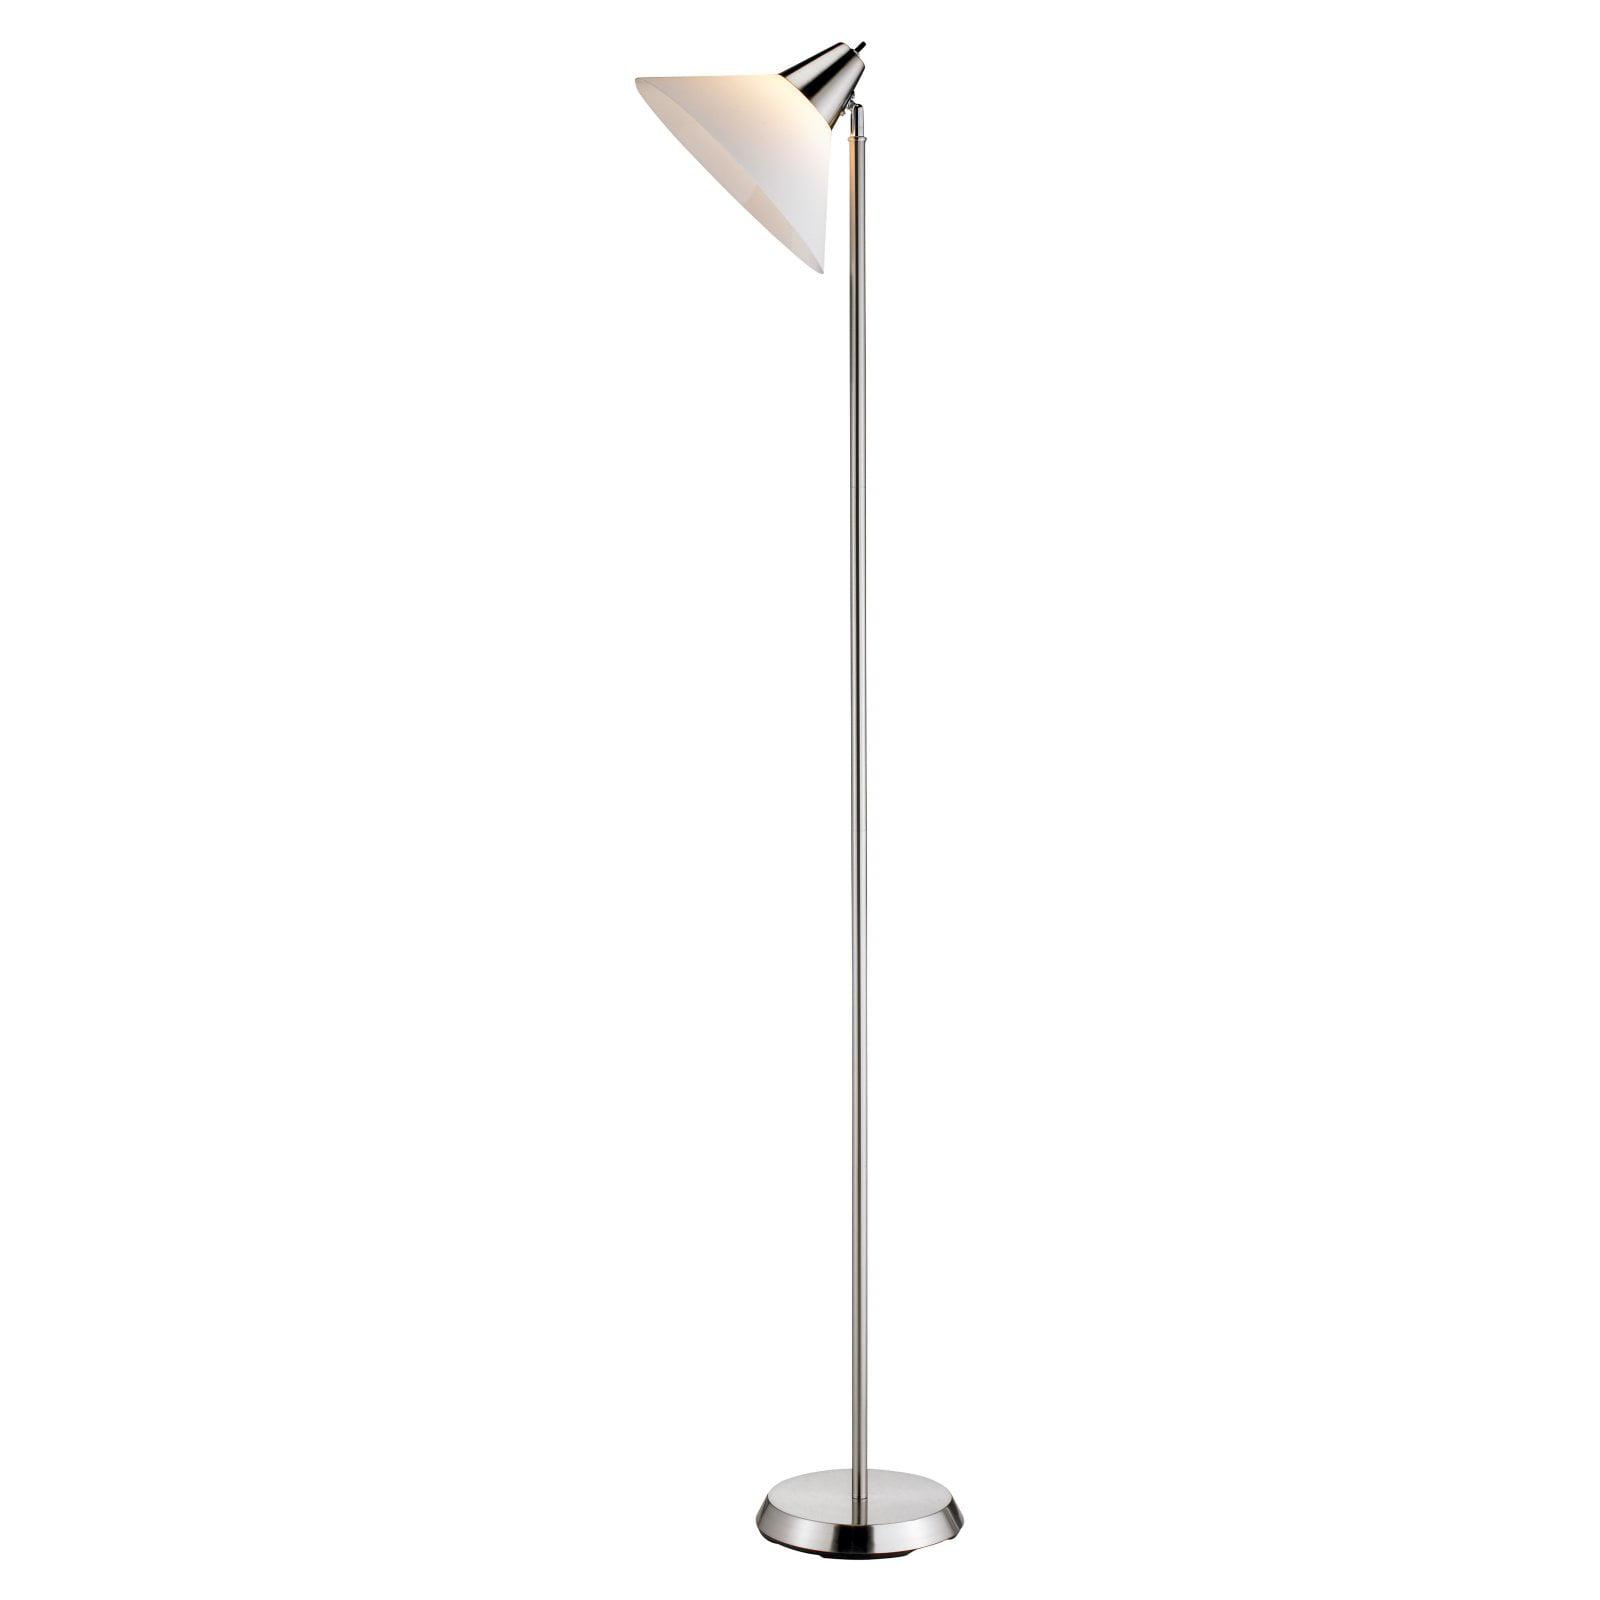 Adesso Swivel Floor Lamp, Satin Steel Finish by Generic